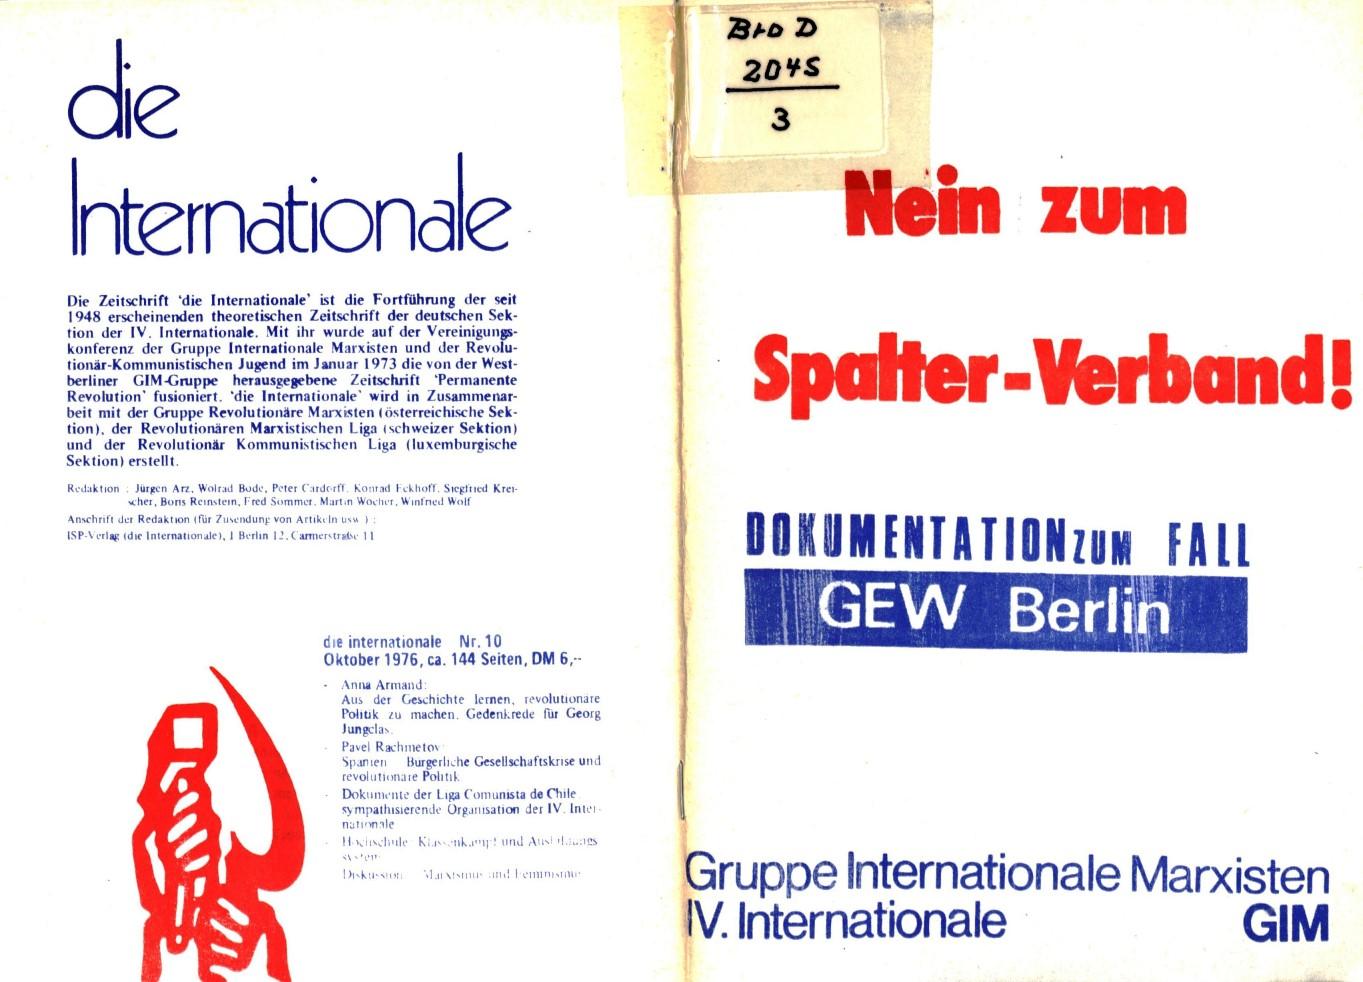 Berlin_GIM_1976_Zum_Fall_GEW_01